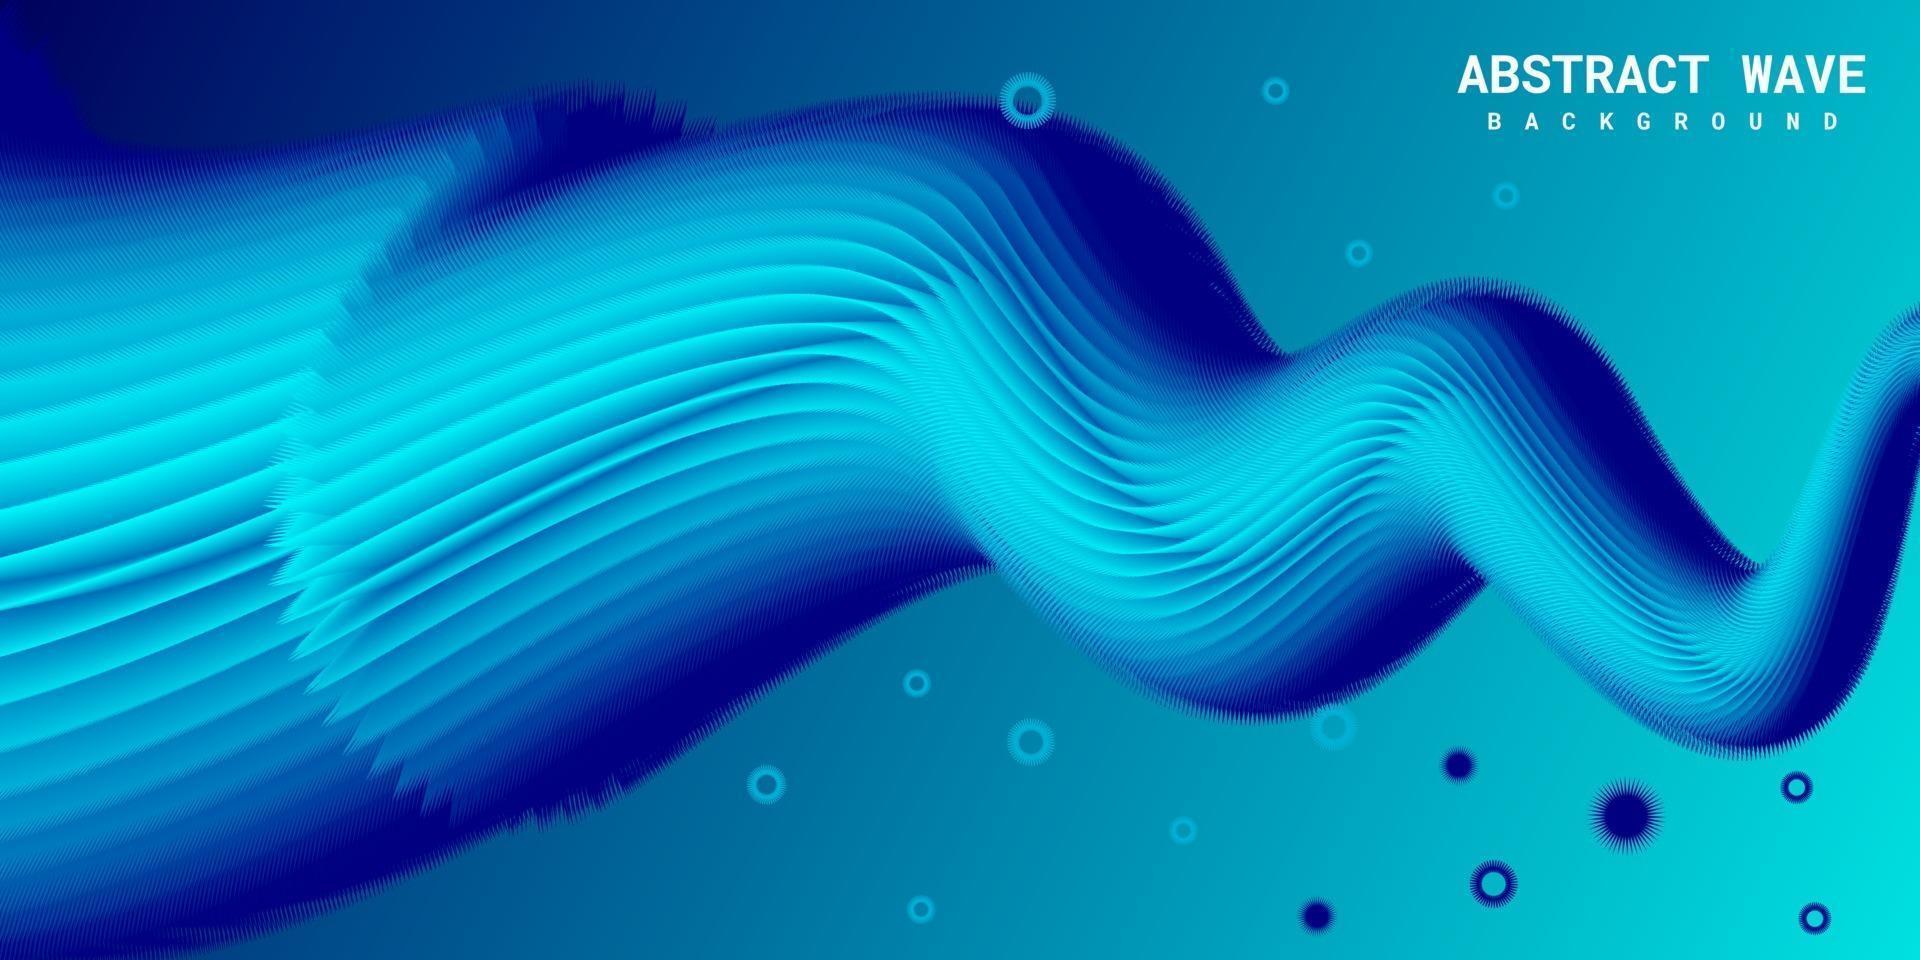 fundo 3d líquido abstrato moderno com gradiente azul vetor